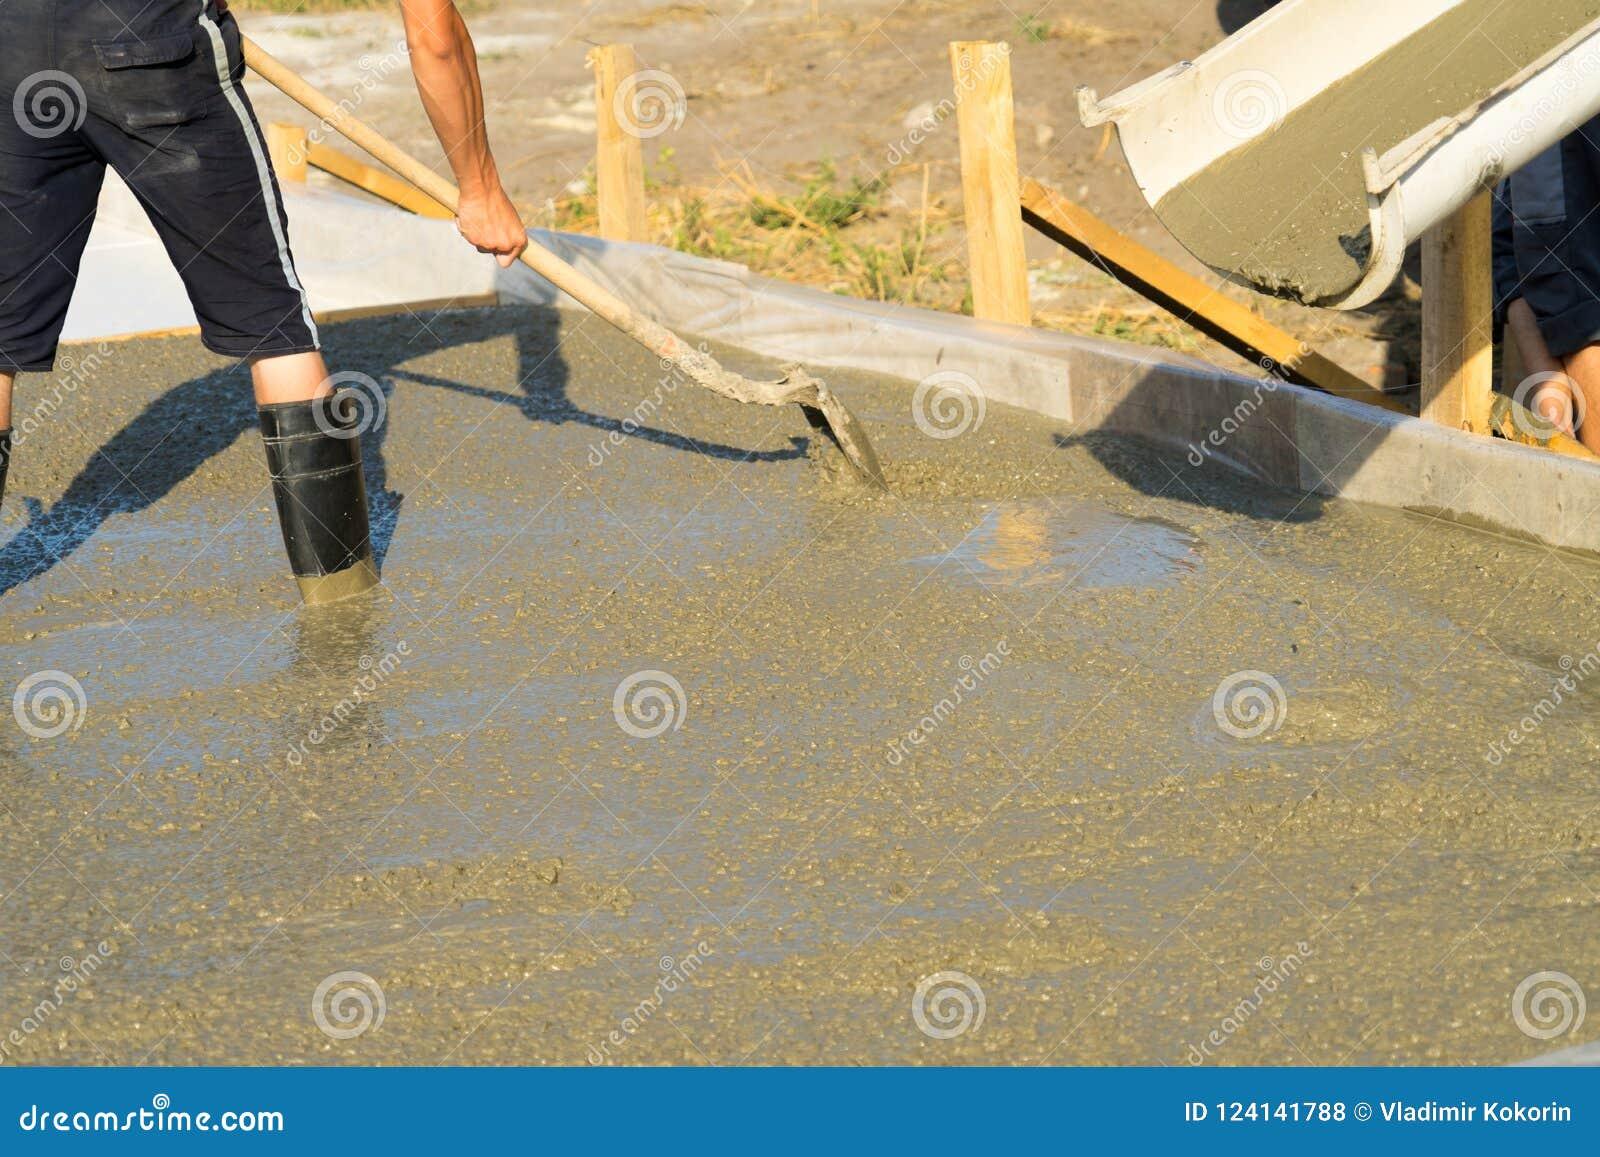 Лить бетон алабушево бетон